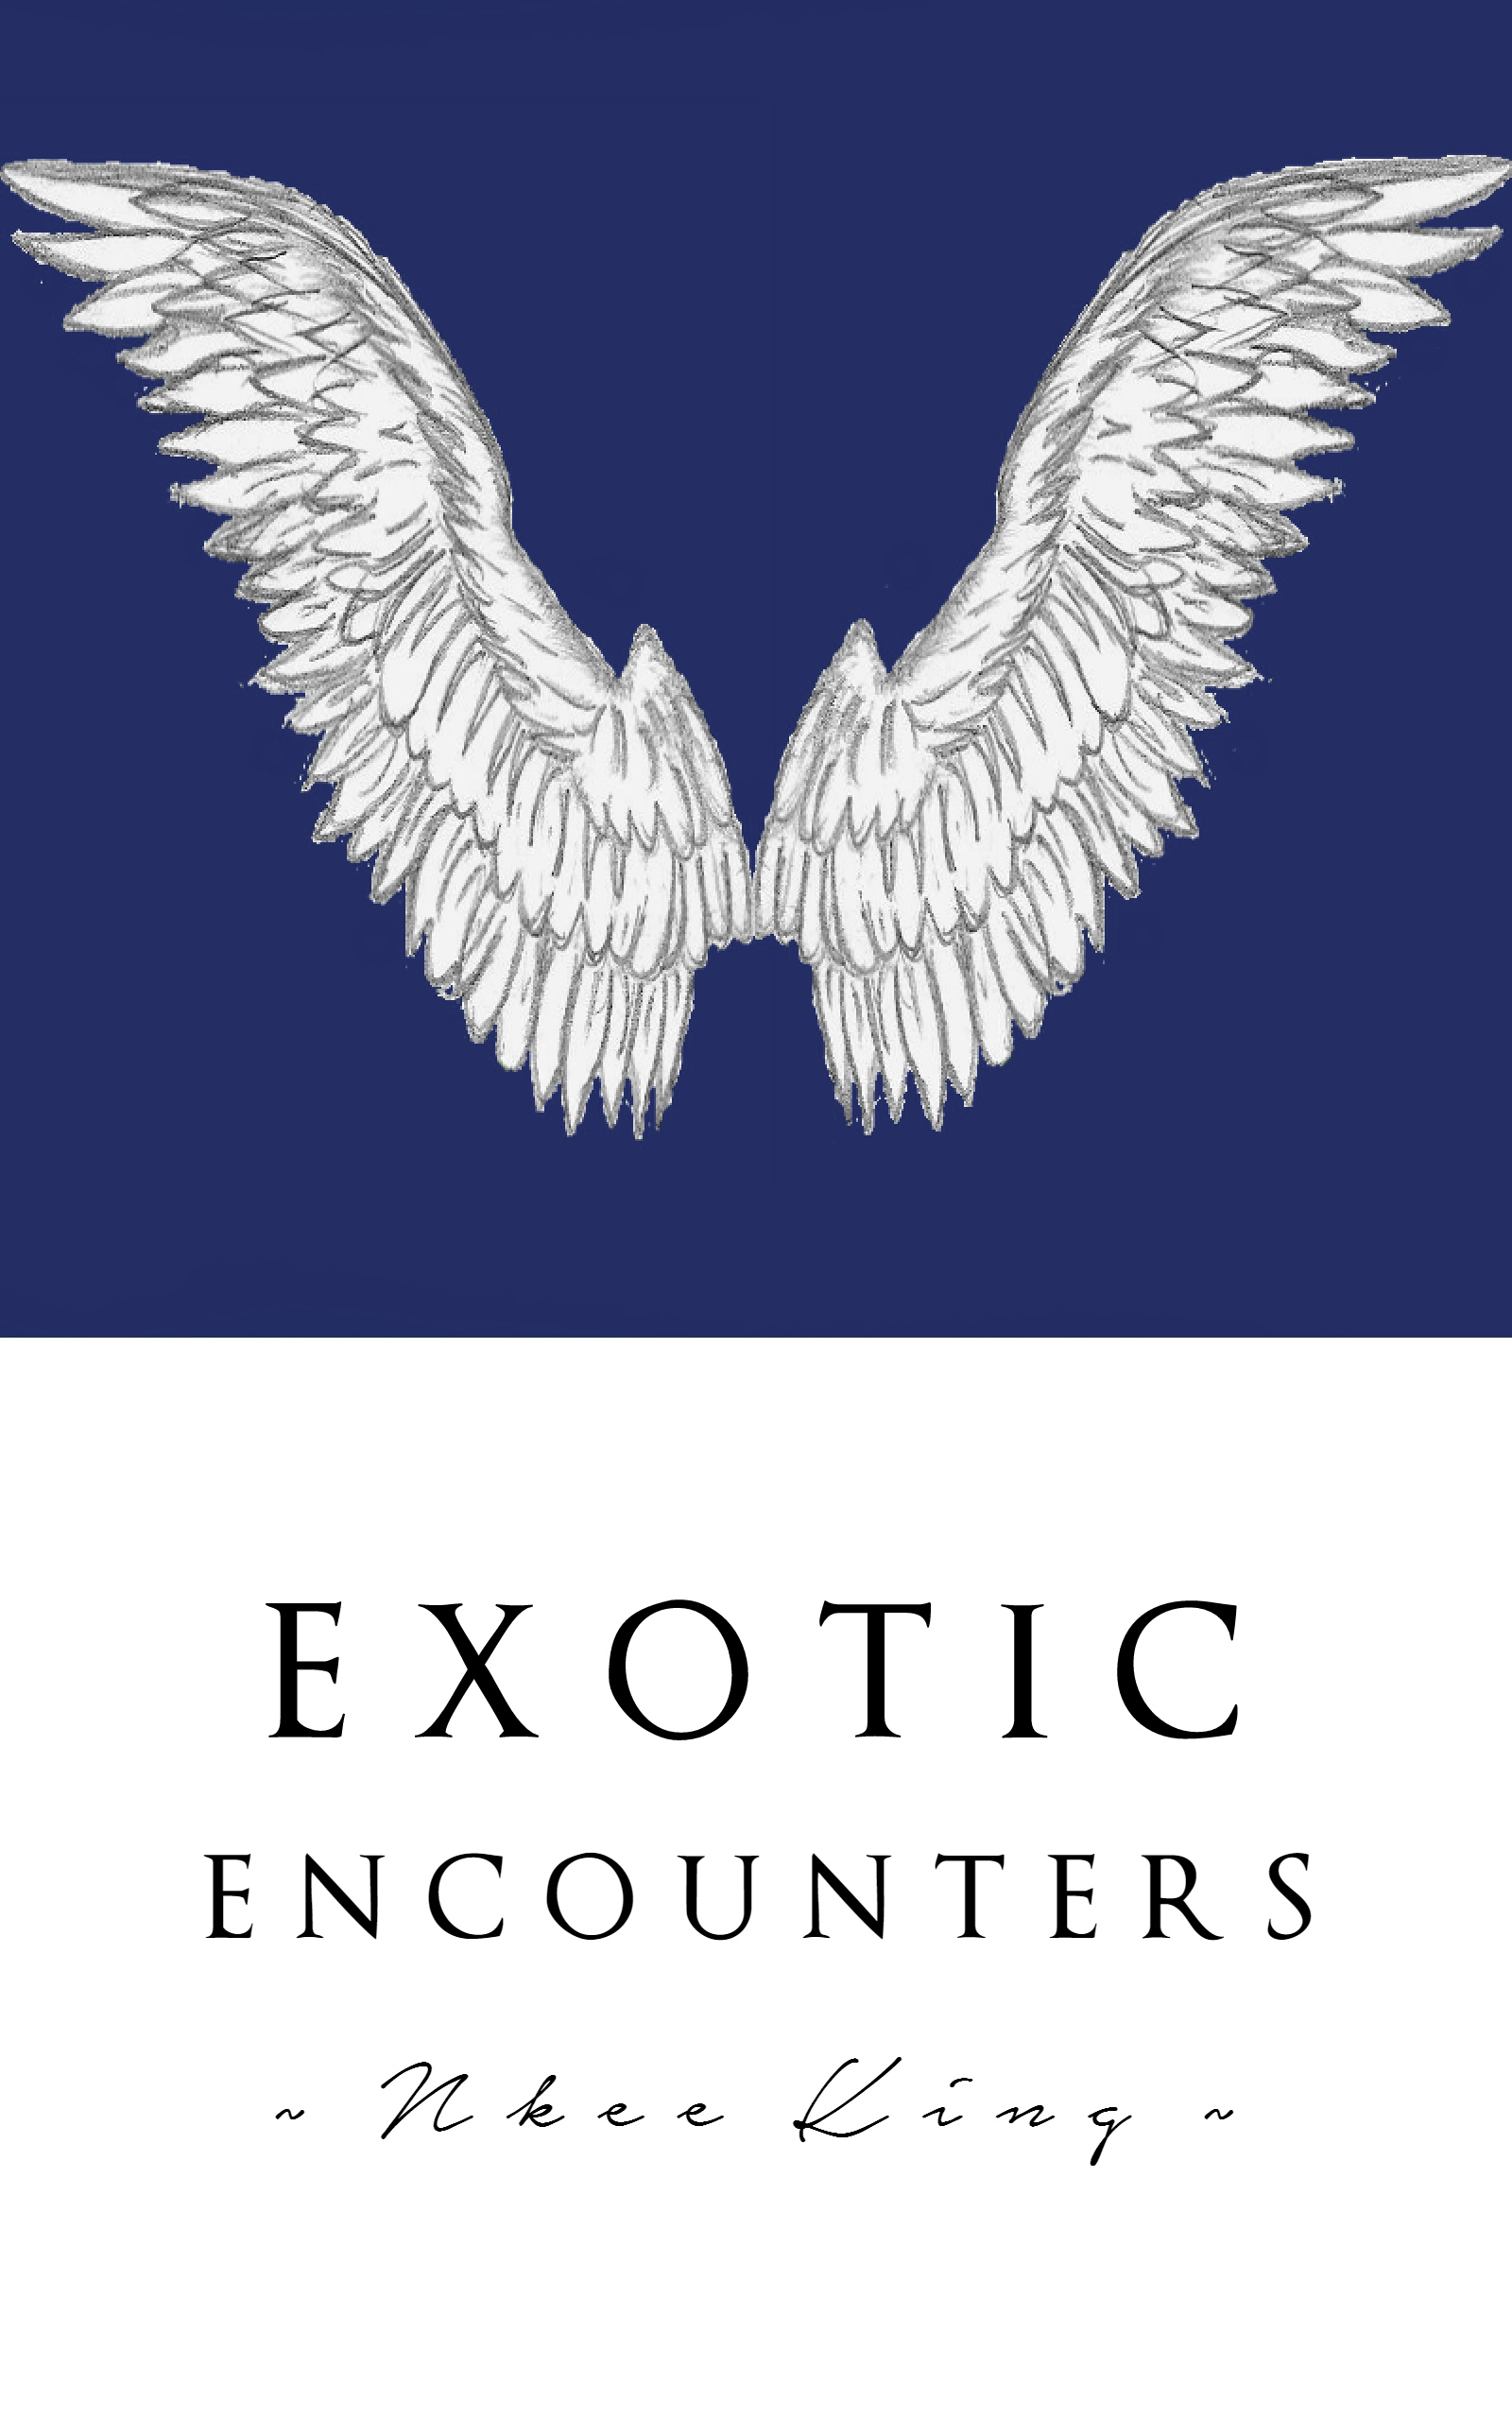 Exotic Encounters Nkee King